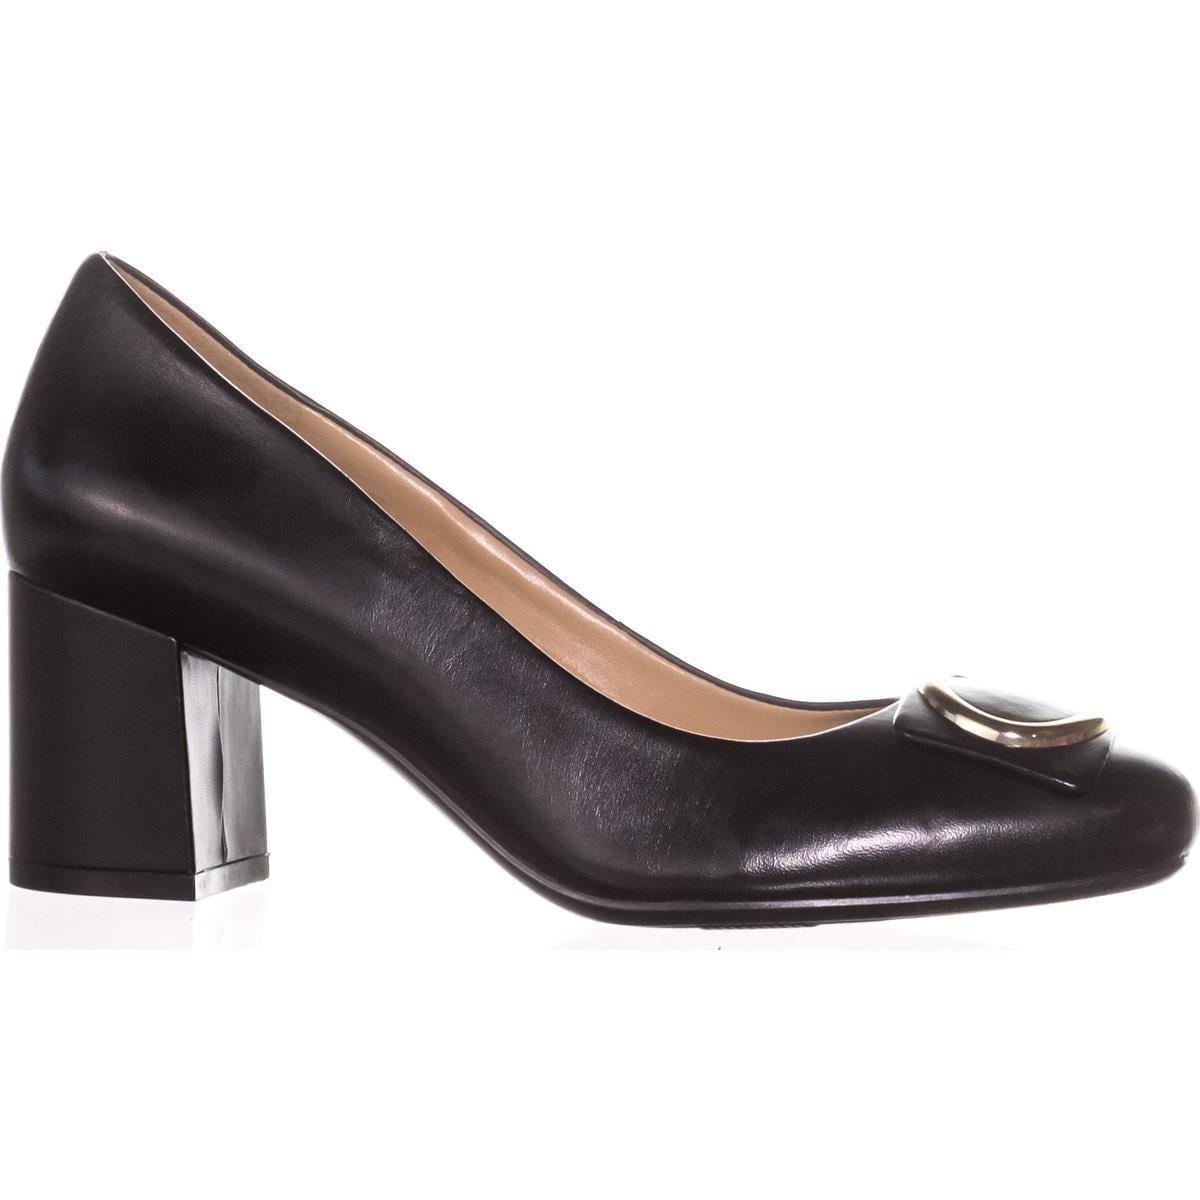 Naturalizer Wright Block Heel Pump(Women's) -Platina Leather Professional Online Newest Sale Online Genuine Sale Online byTtRDSY4